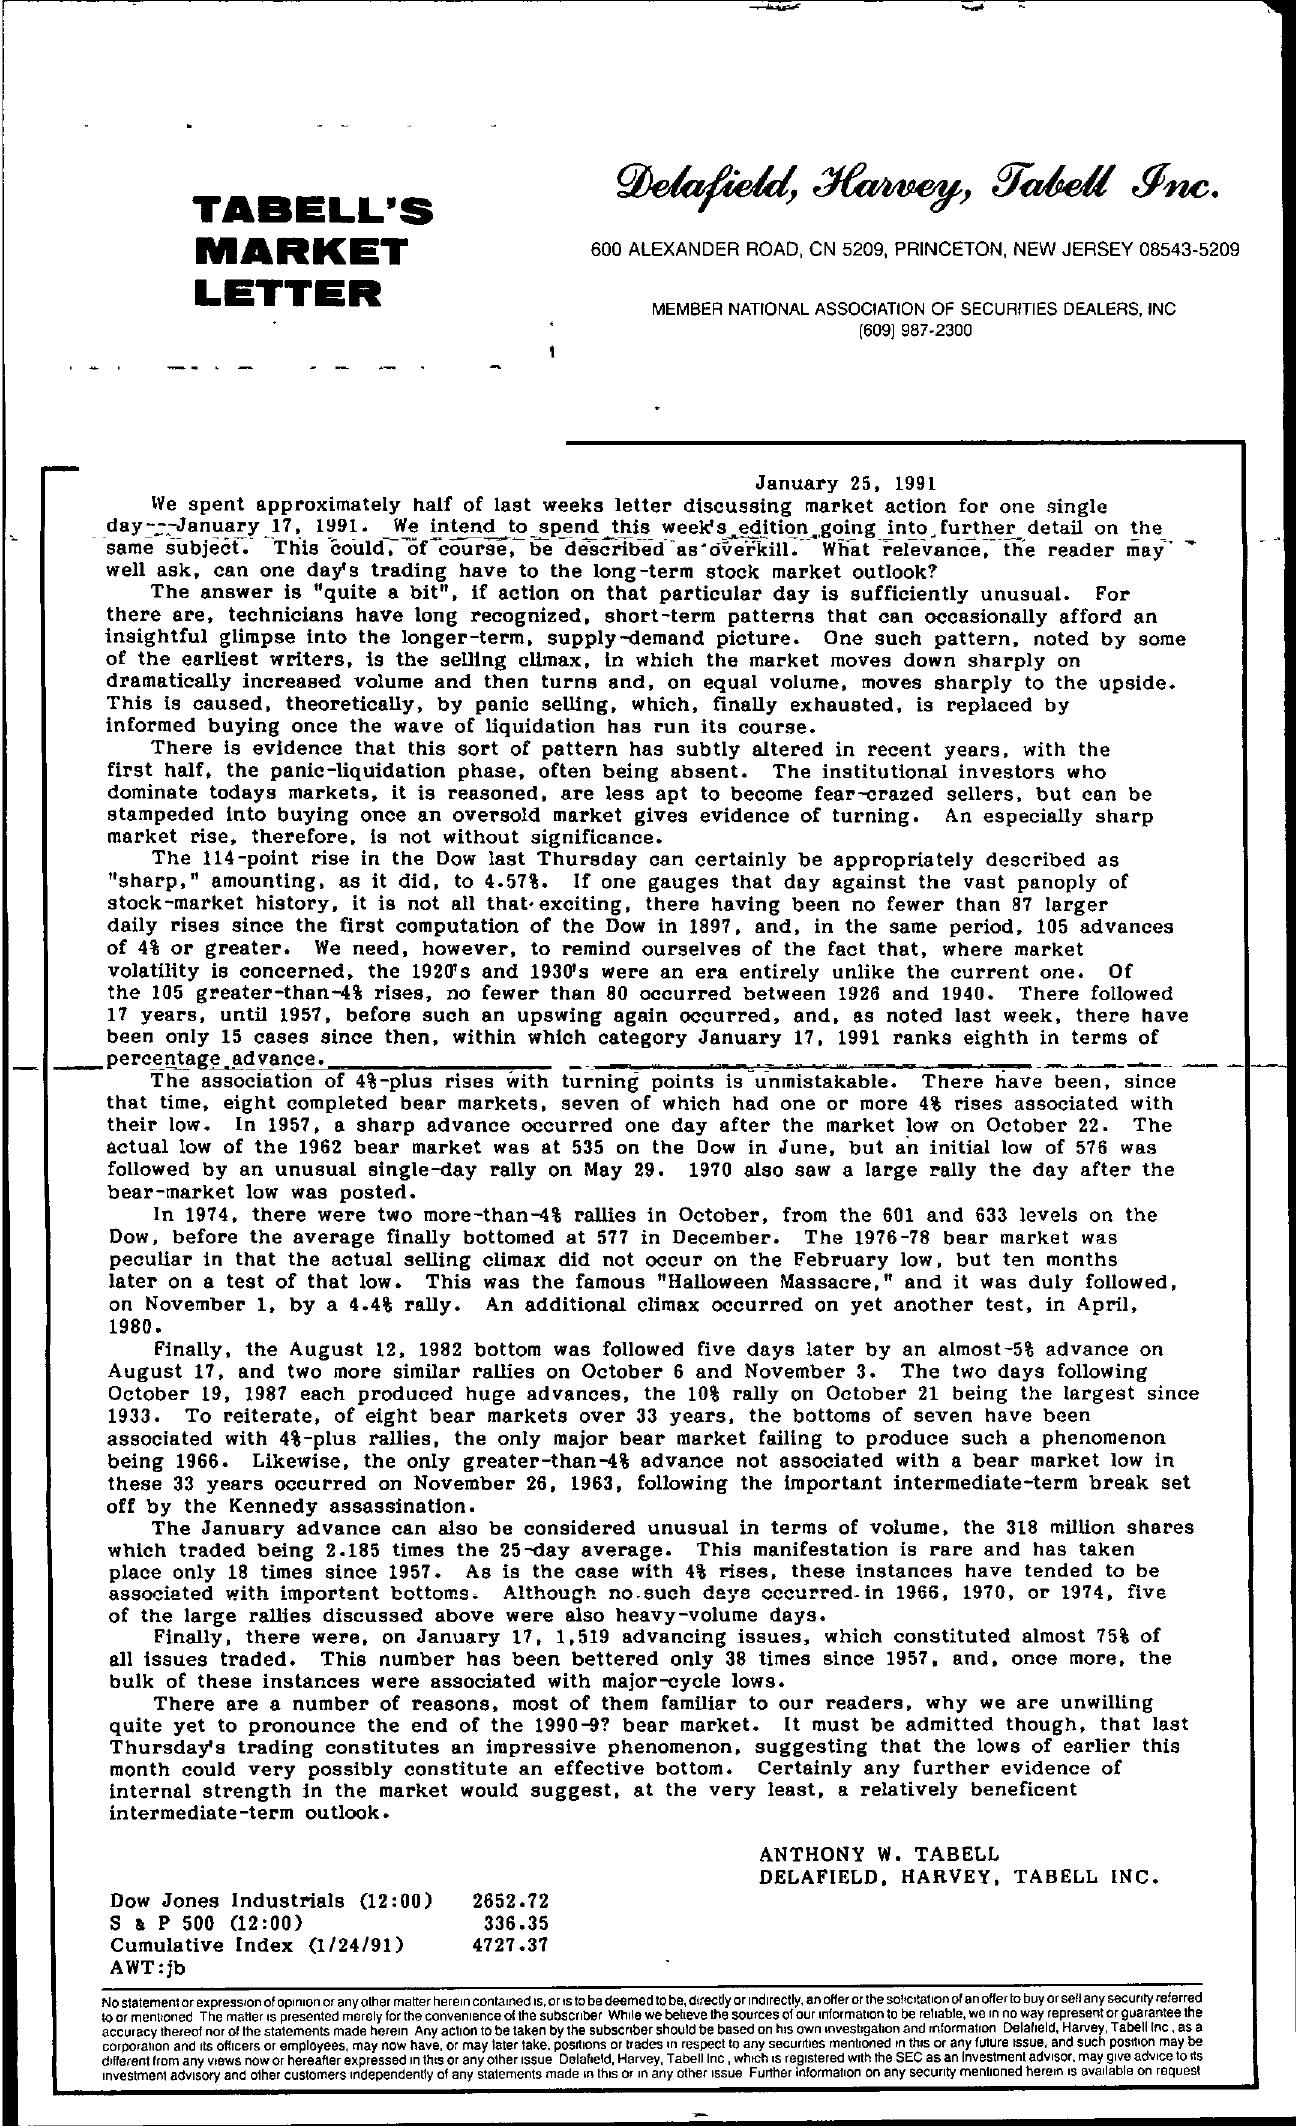 Tabell's Market Letter - January 25, 1991